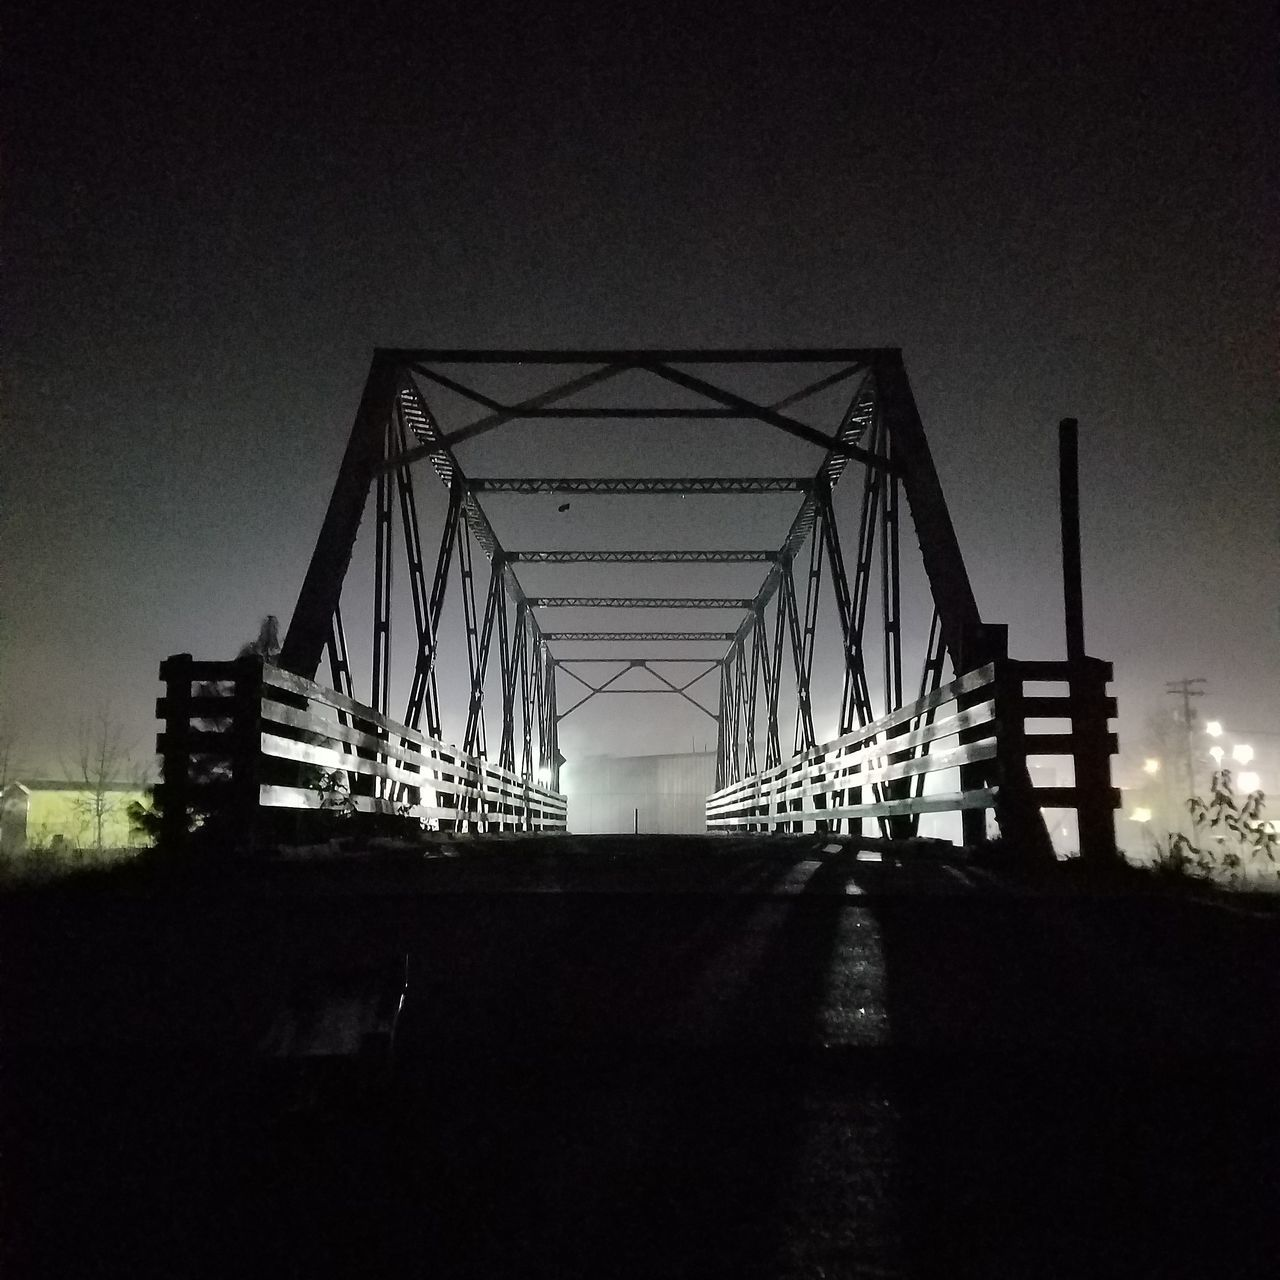 Richardson Bridge Bridge - Man Made Structure Outdoors Night Nature West Eugene Urban Photography Darkness And Light